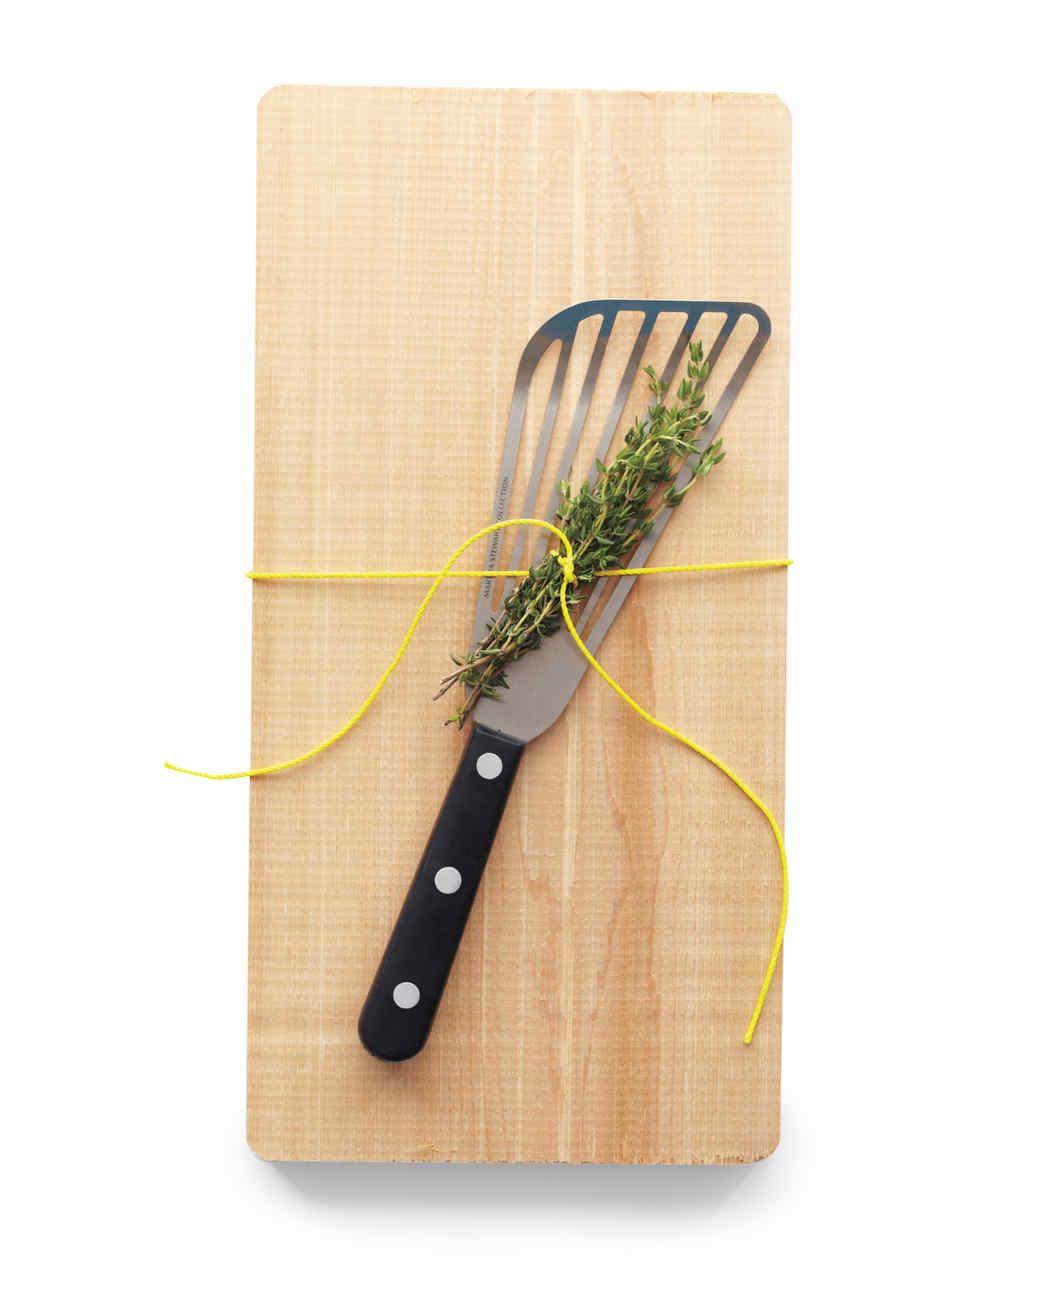 cutting-board-spatula-thyme-mld108821.jpg